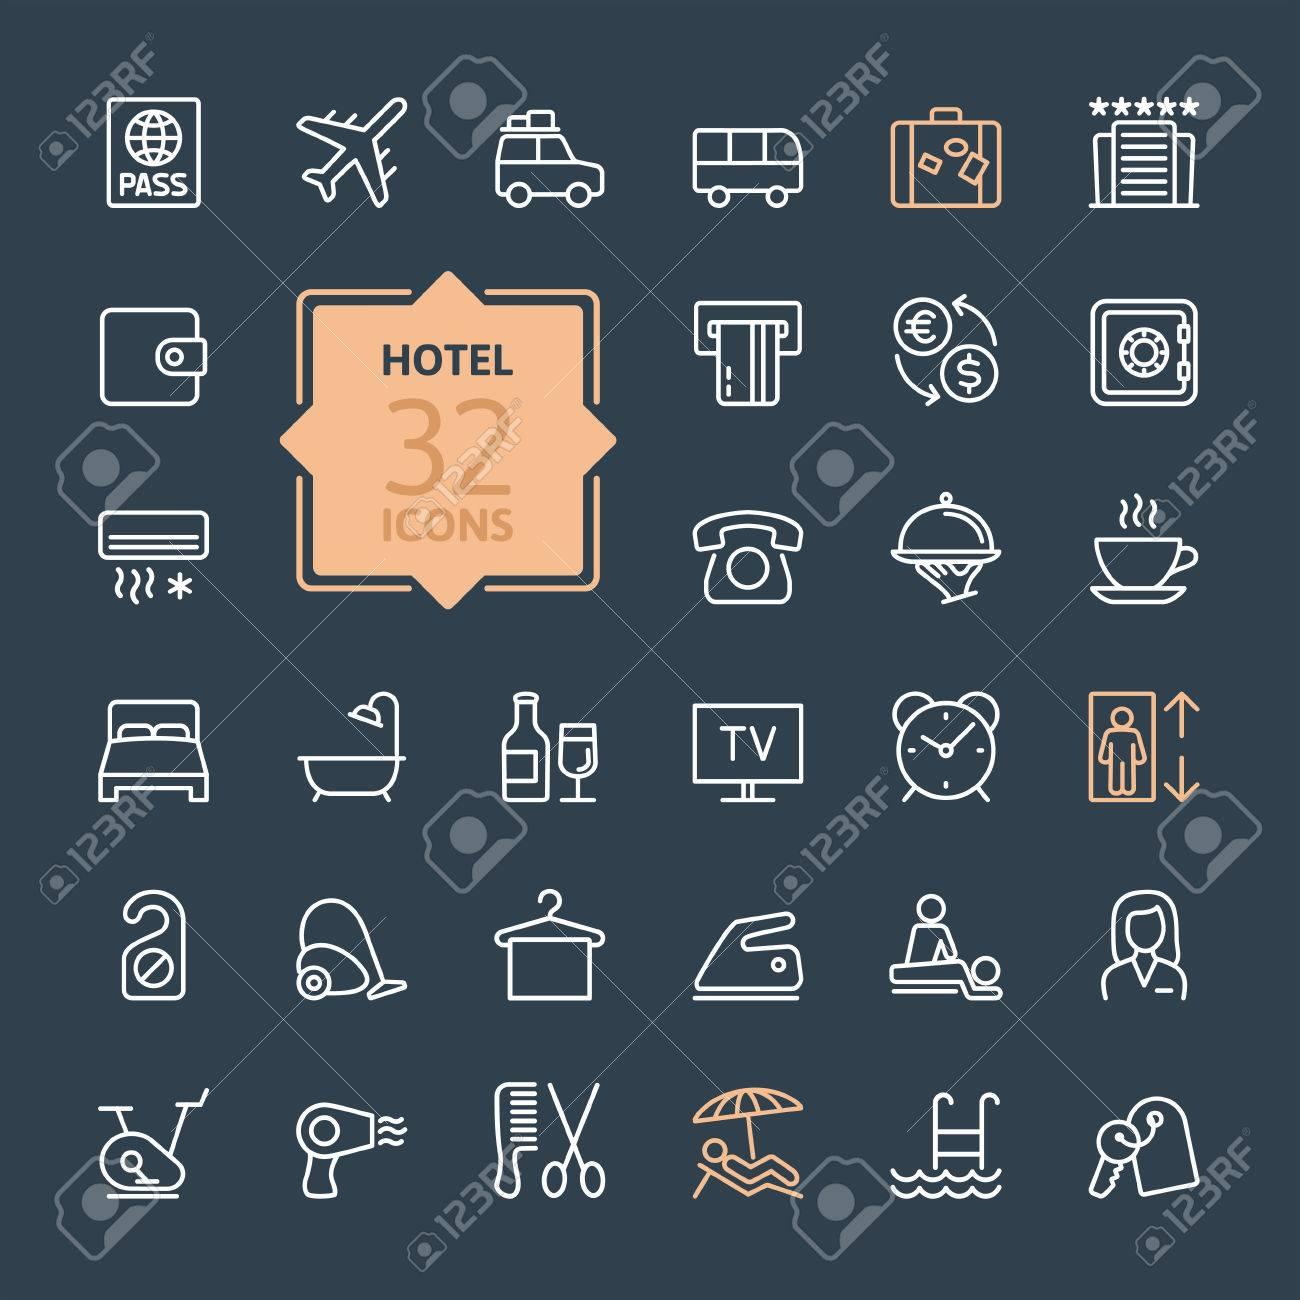 Outline web icon set Hotel services - 41785805